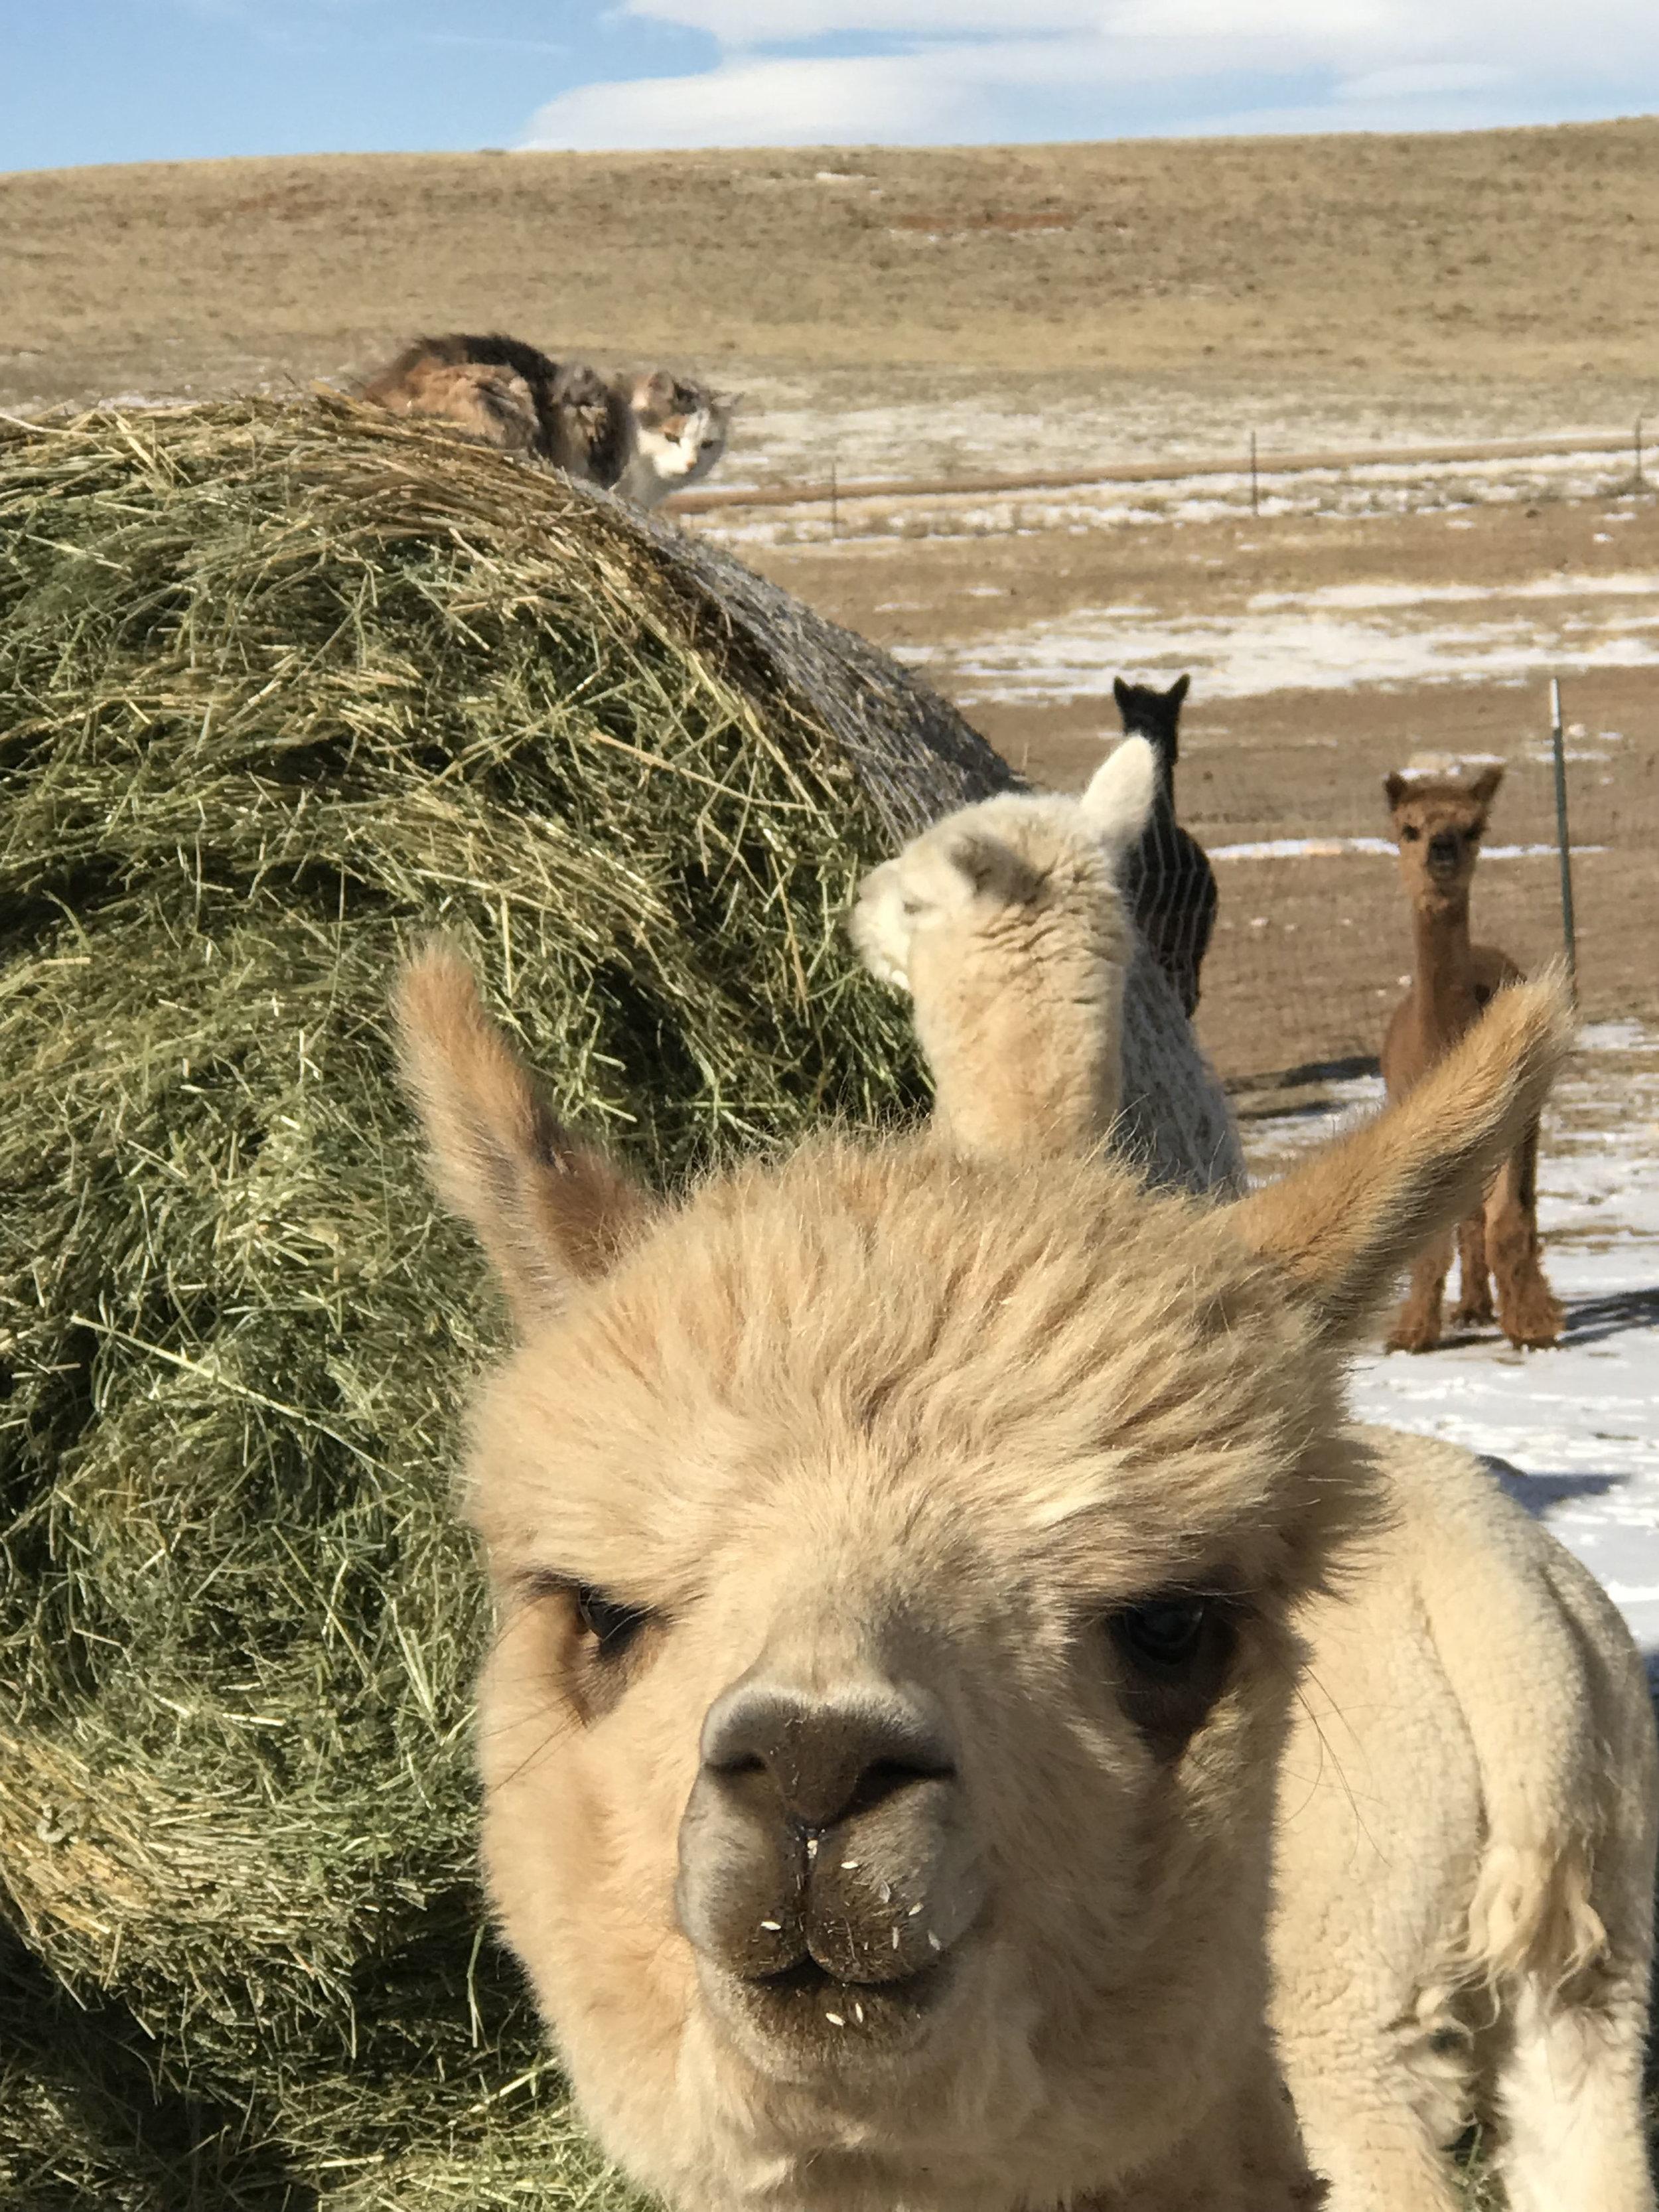 George the alpaca